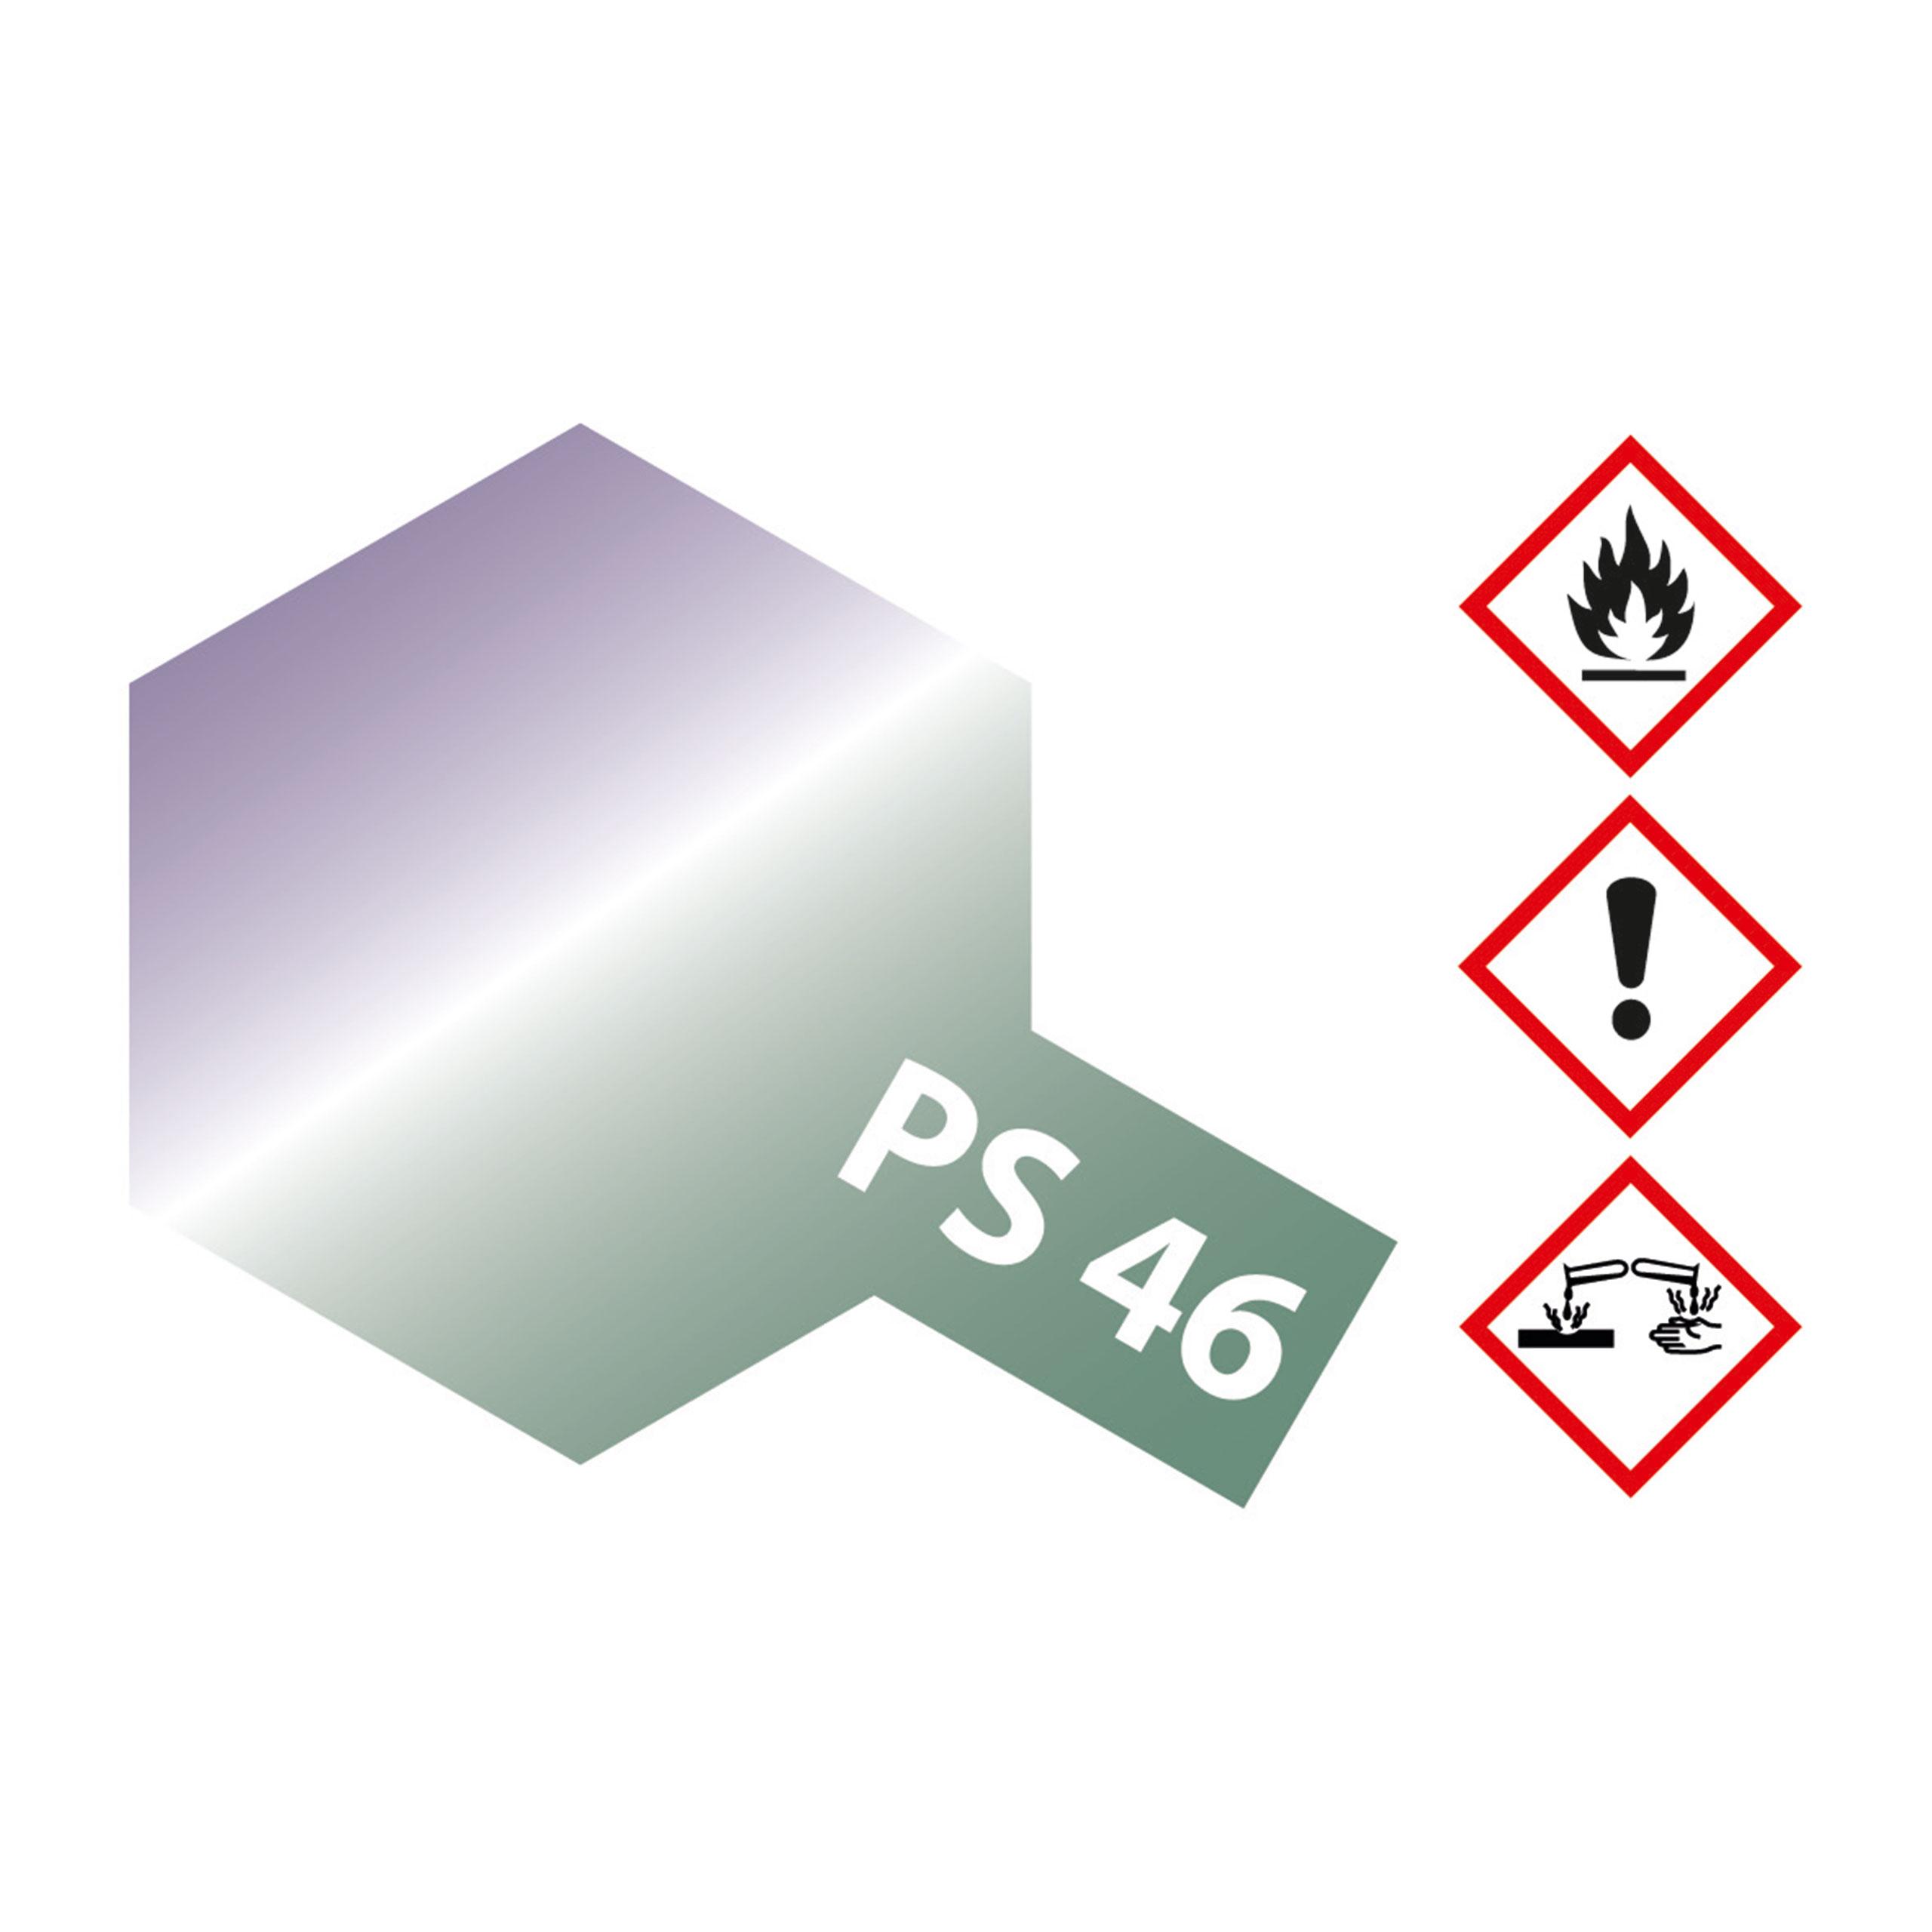 PS-46 Grün-Violett schillernd Poly. - 100ml Sprayfarbe Lexan - Tamiya 300086046